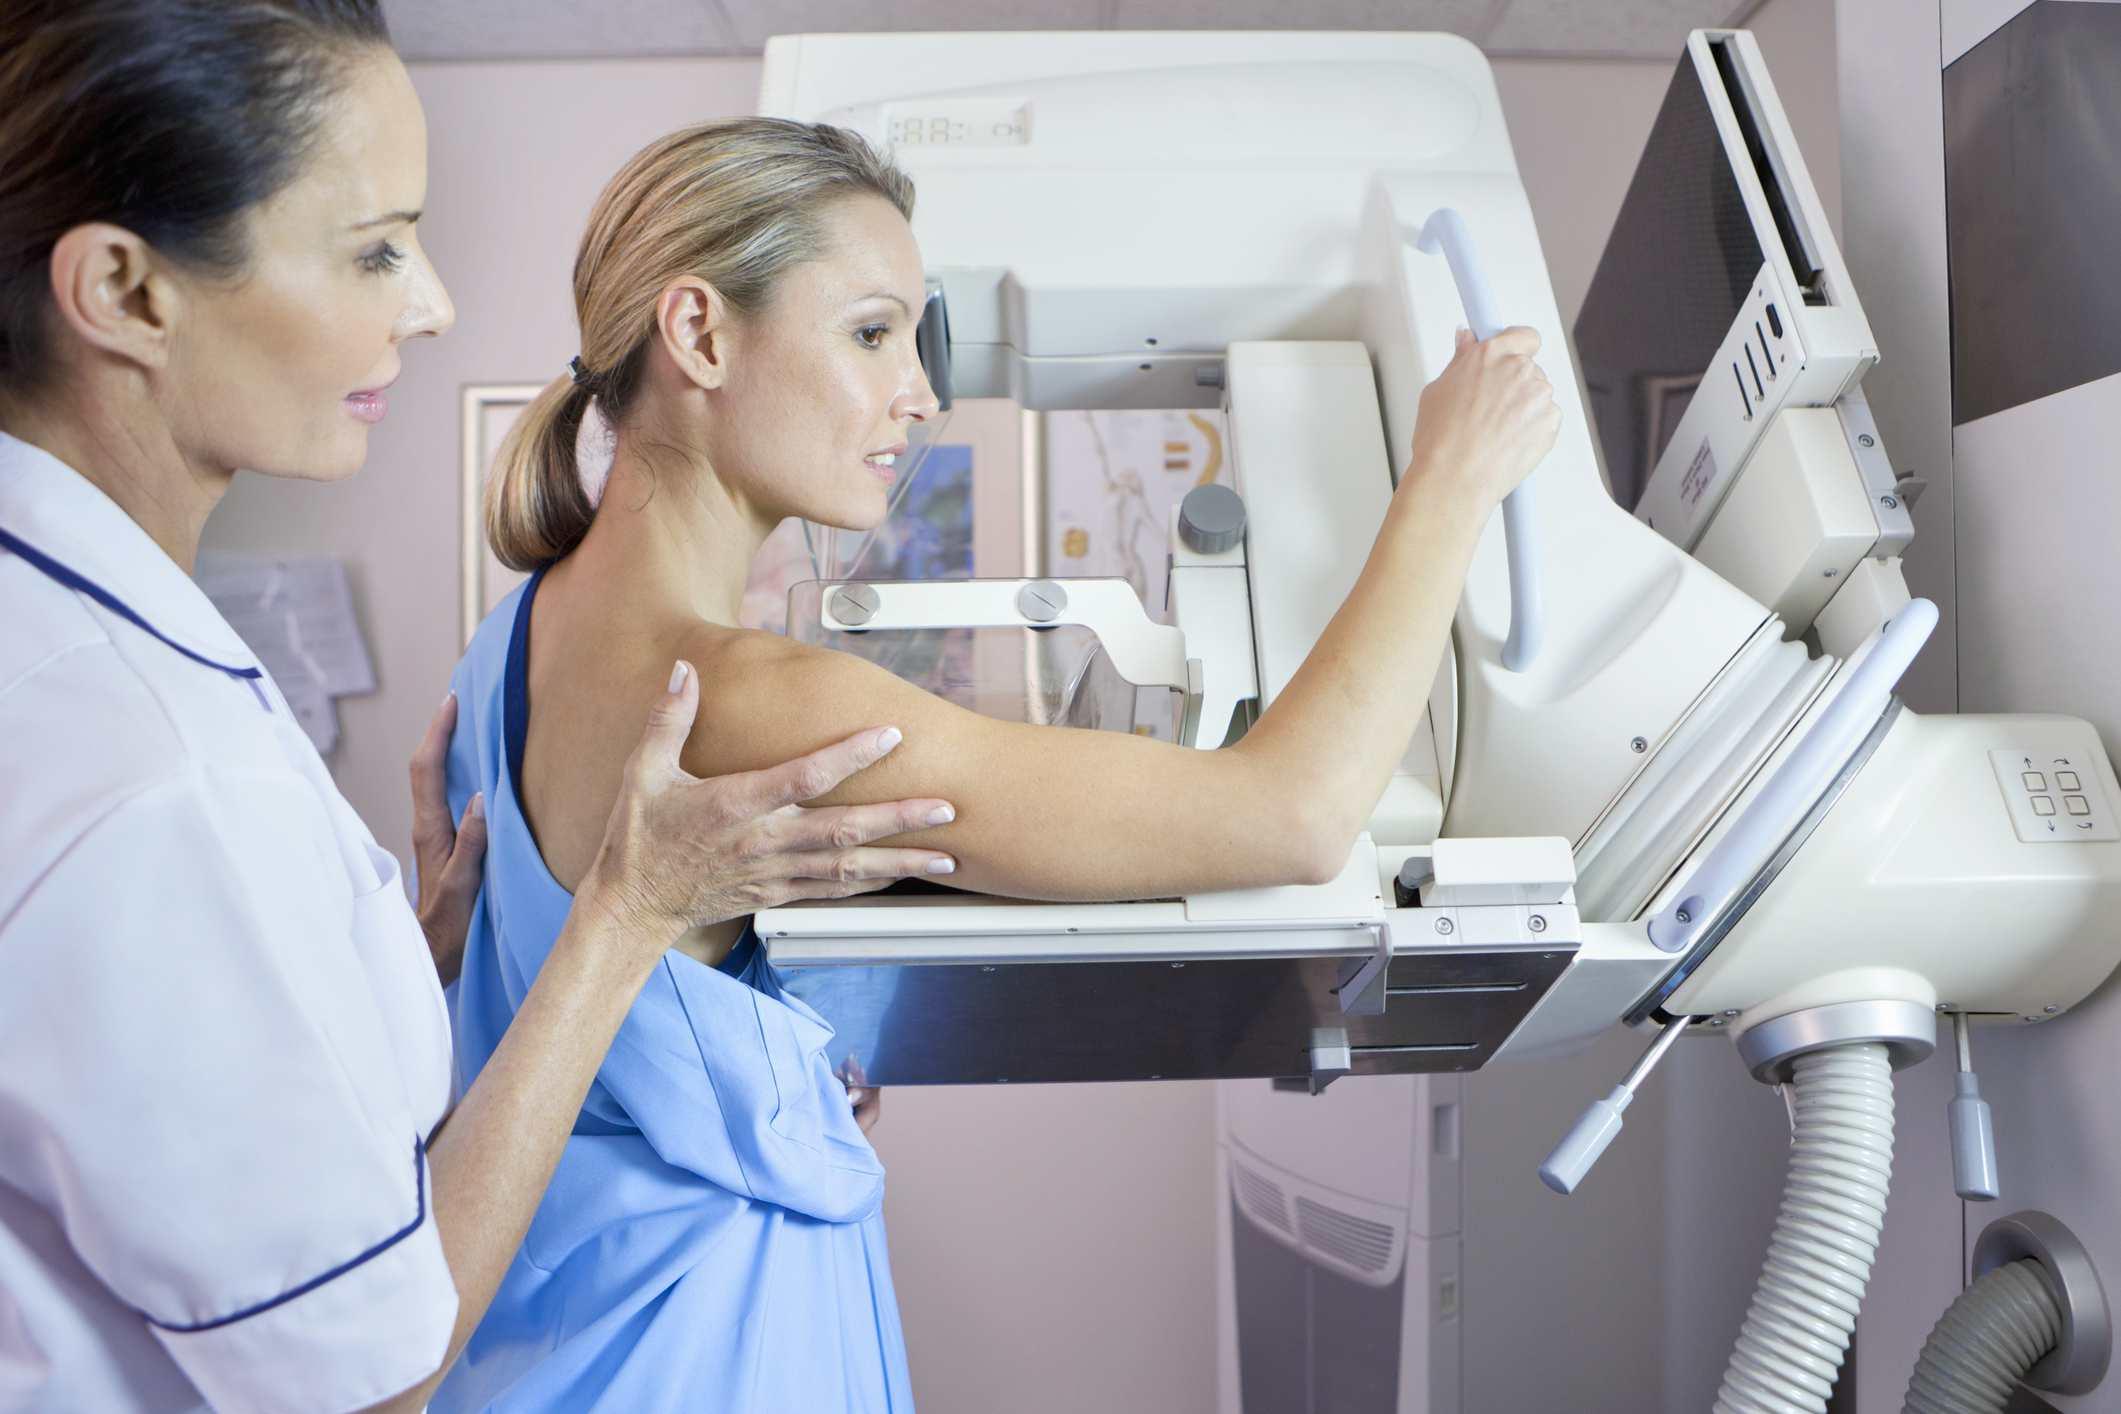 Woman getting a mamogram